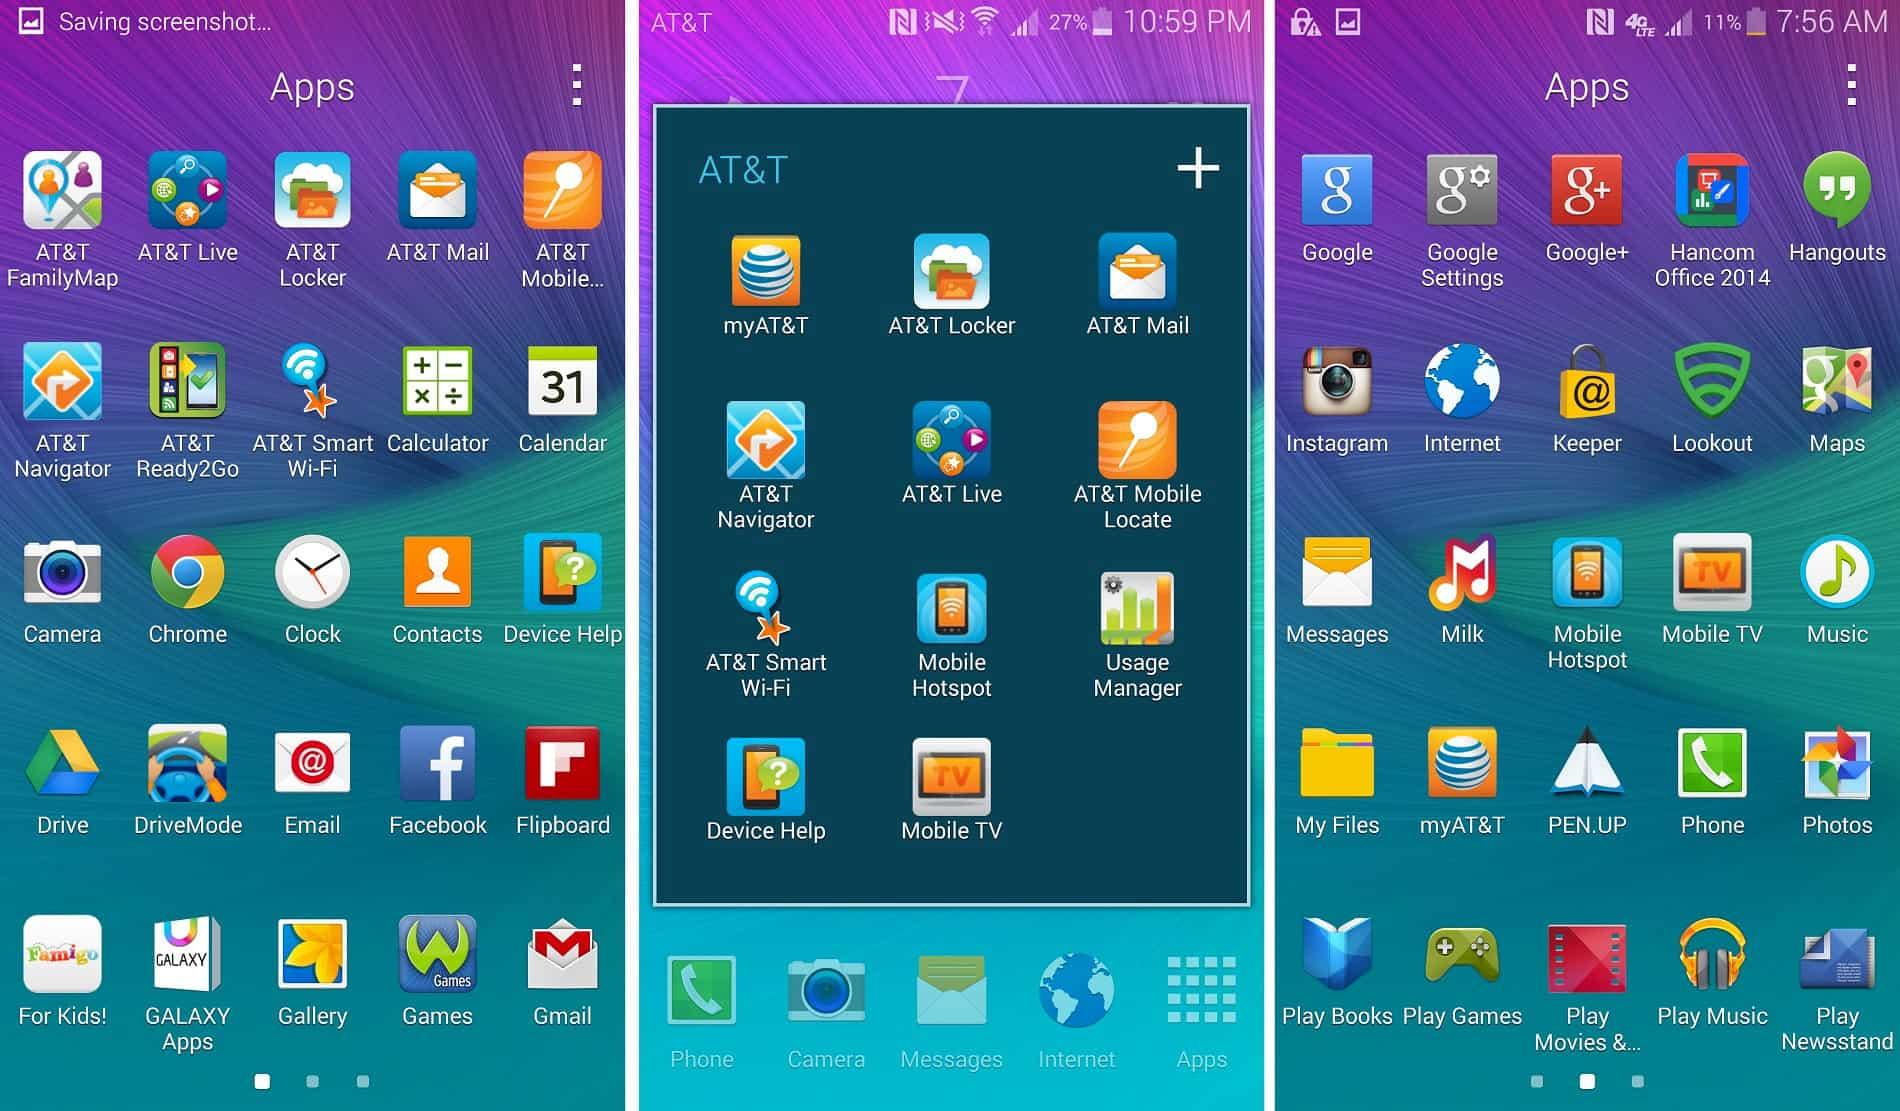 Samsung Note 4 Screenshots-5